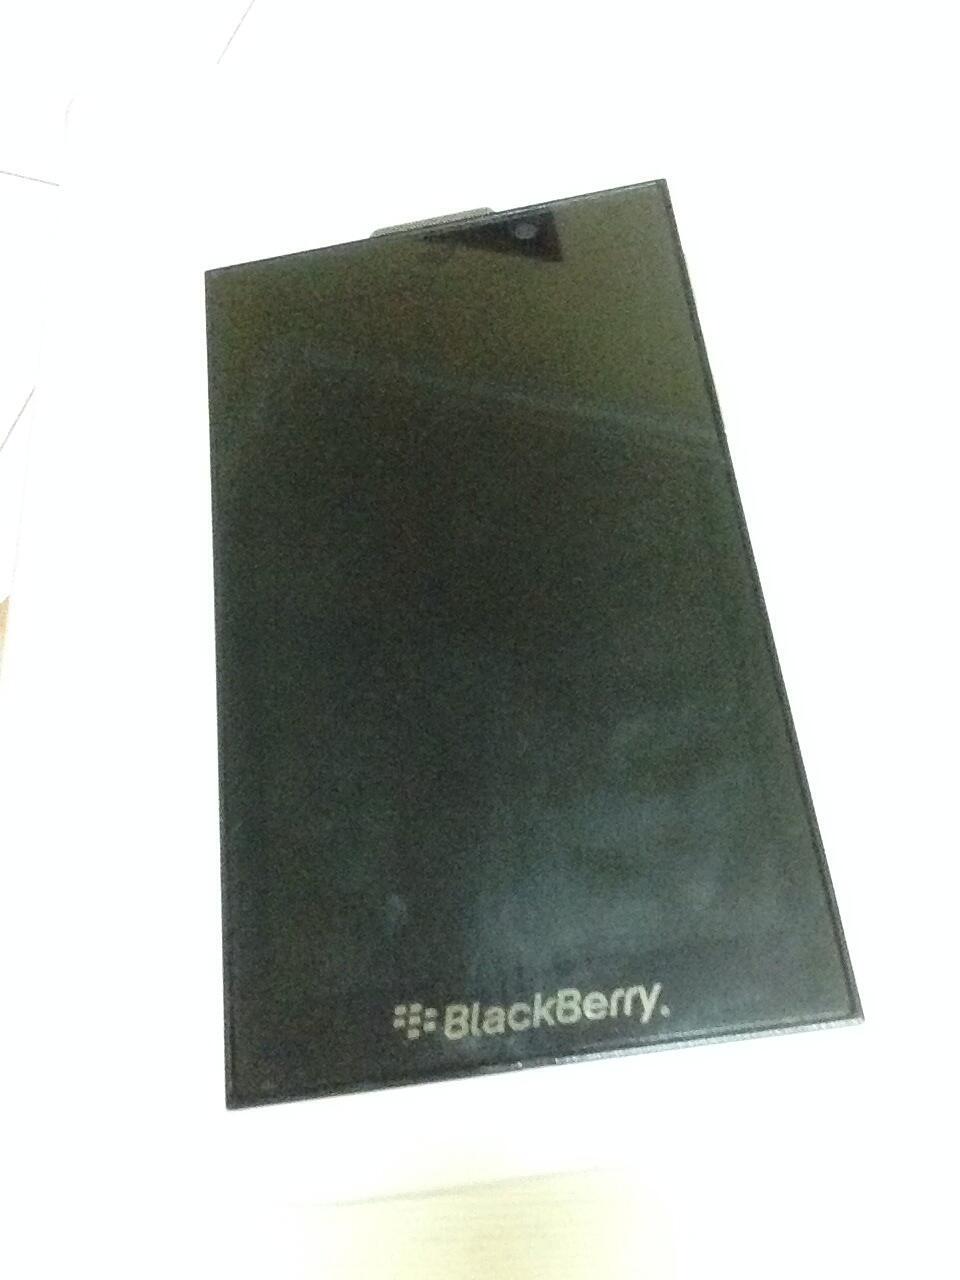 Blackberry Z10 white (TAM warranty) plus vizz double battery